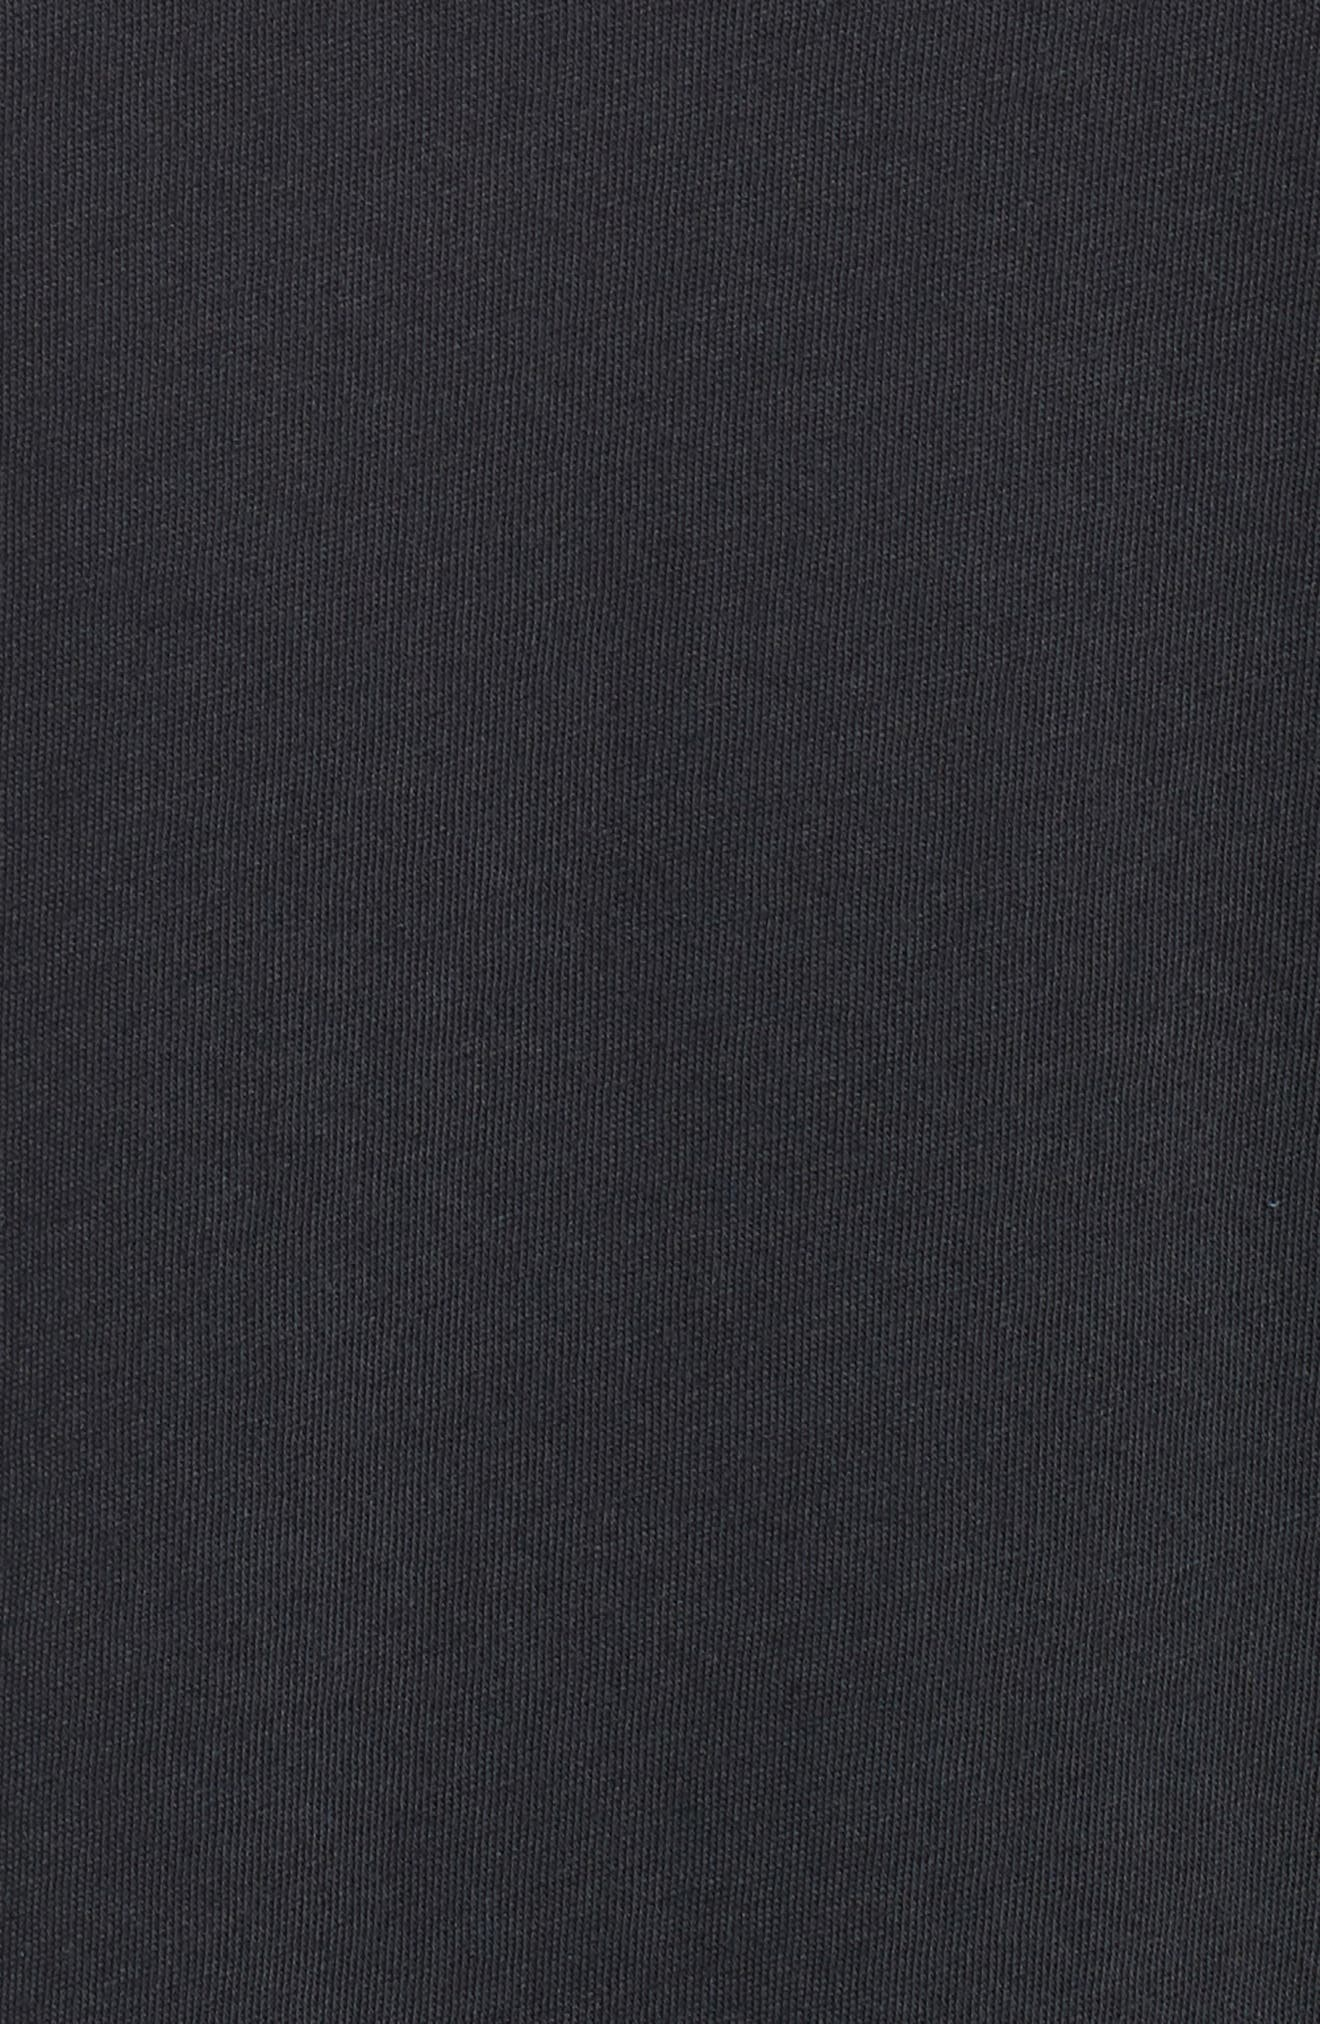 Sportstyle Loose Fit T-Shirt,                             Alternate thumbnail 5, color,                             BLACK